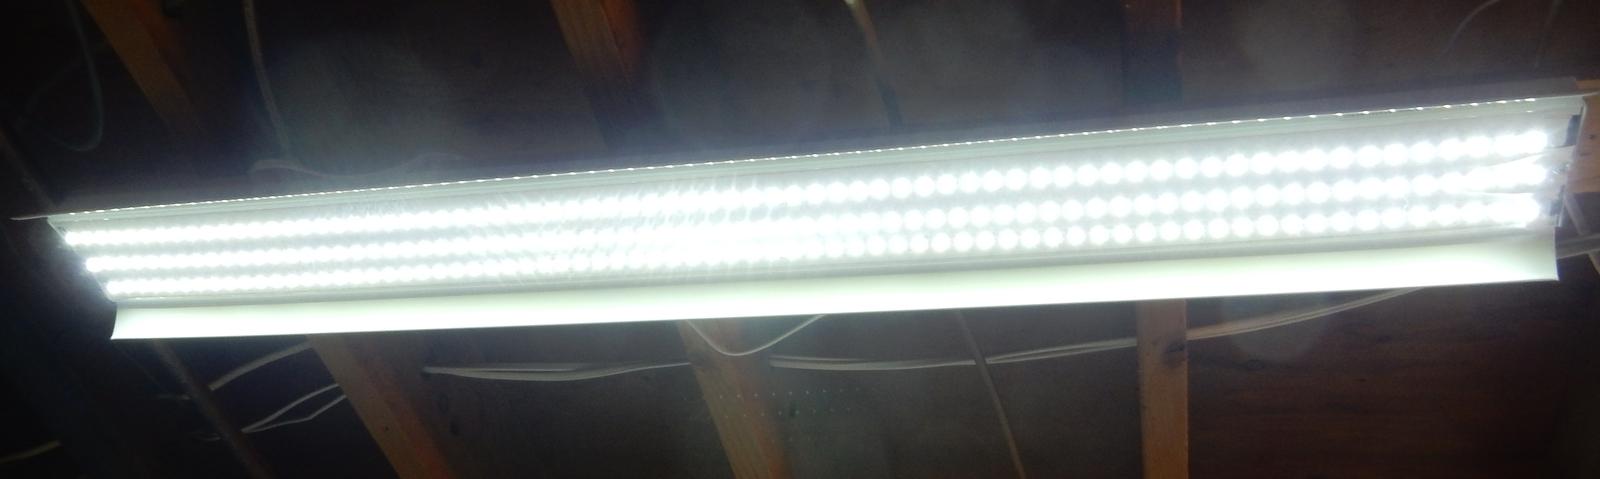 Kit: 60W Power Supply + 2x 4' LED Strips, Bright White, Florescent Tube Retrofit